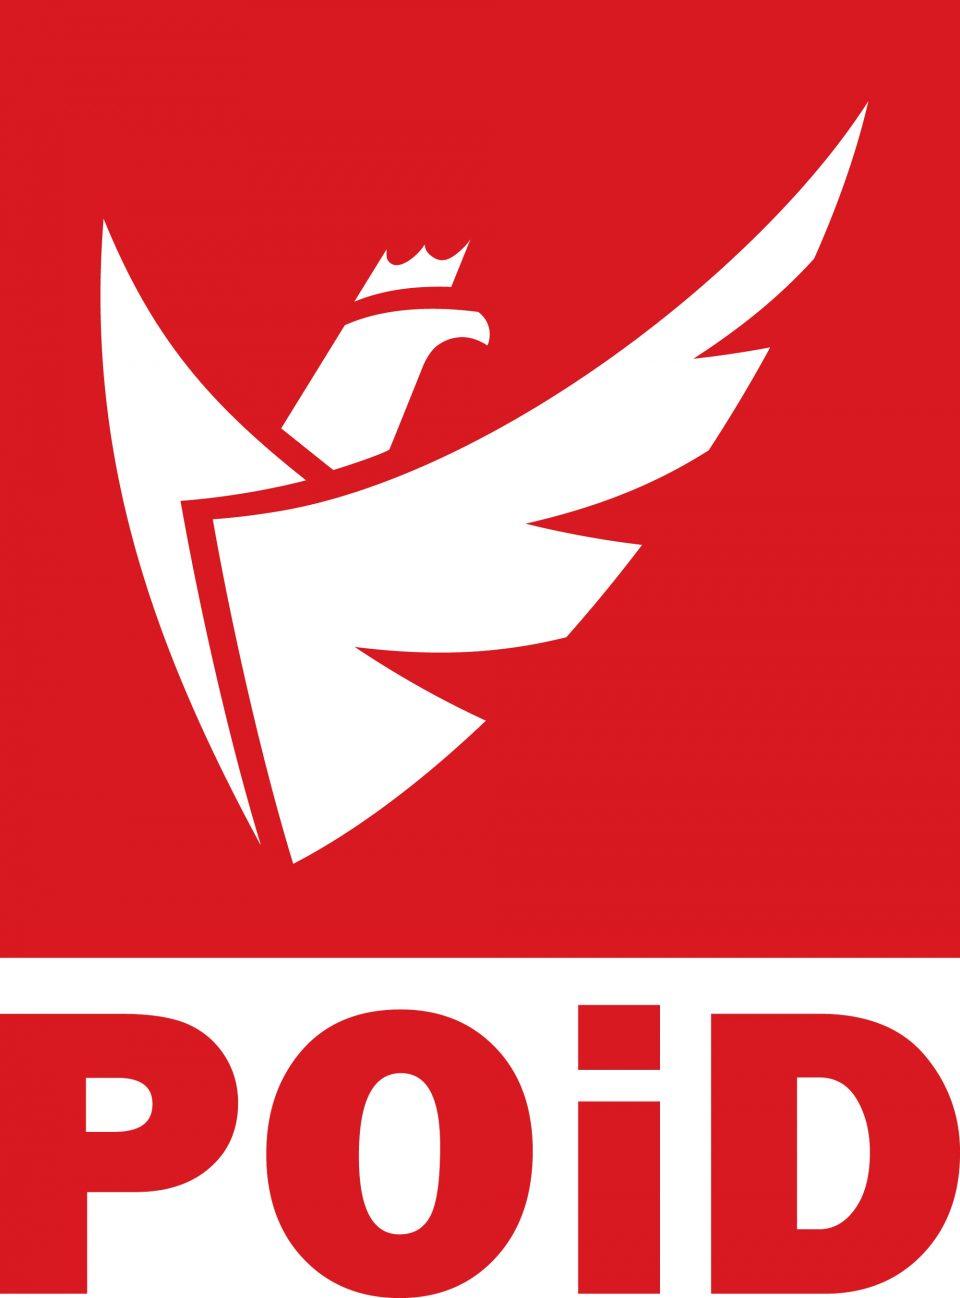 poid_logo_2000px